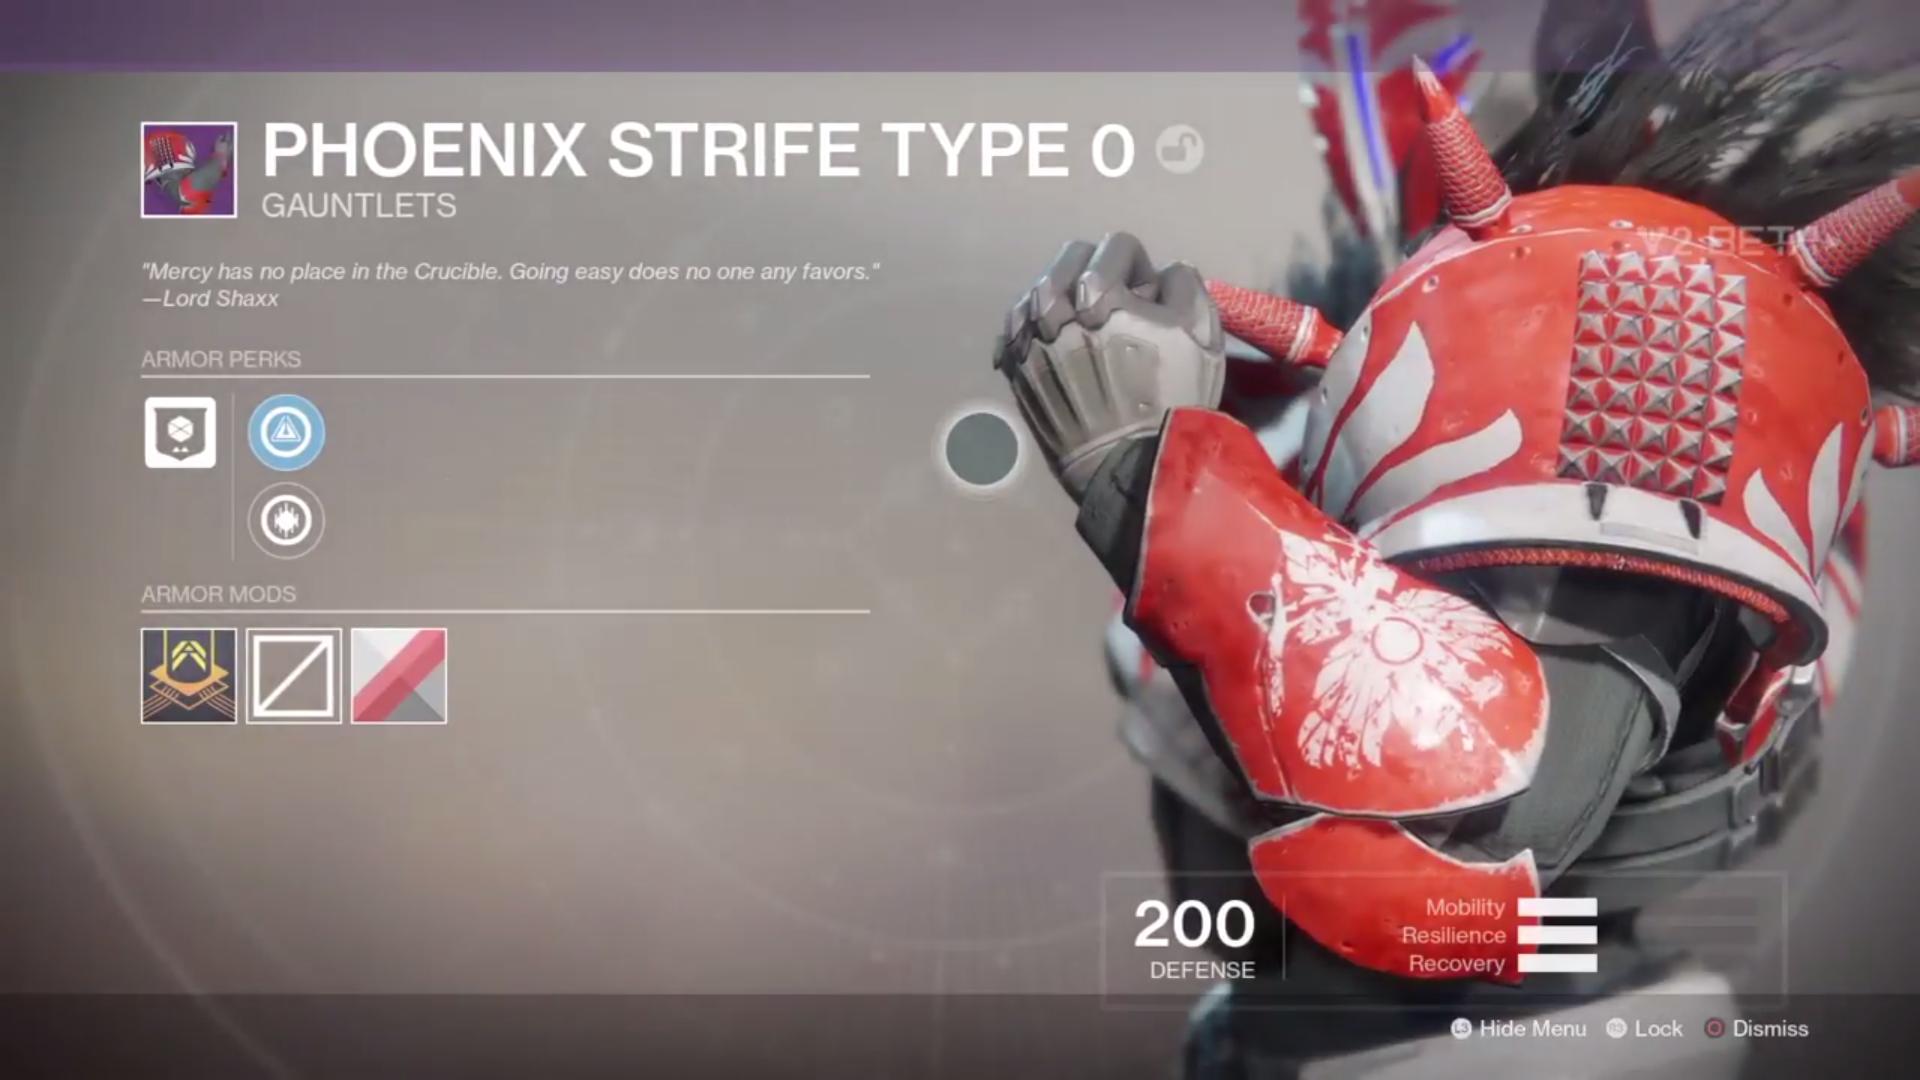 destiny 2 beta phoenix strife type 0 gauntlets